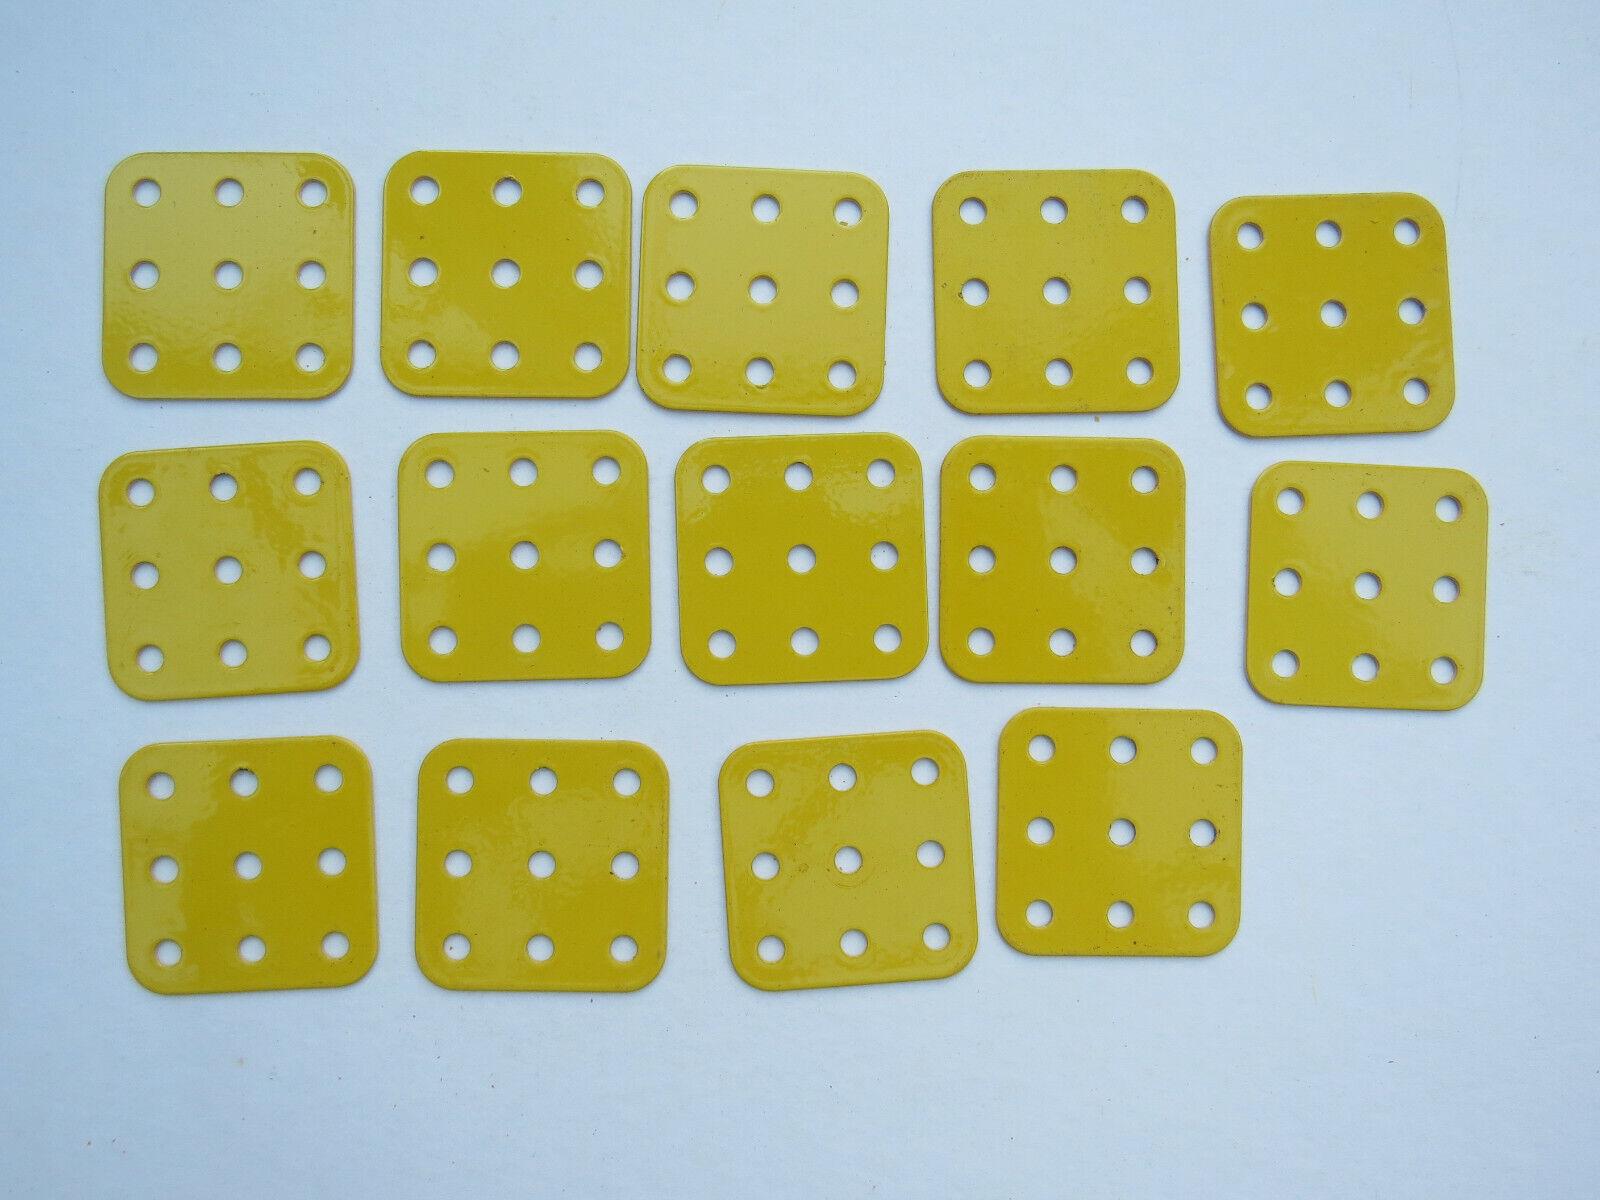 Meccano Rigid Flat Plate 1.5 X 1.5 74 X 14 Yellow French - £8.50